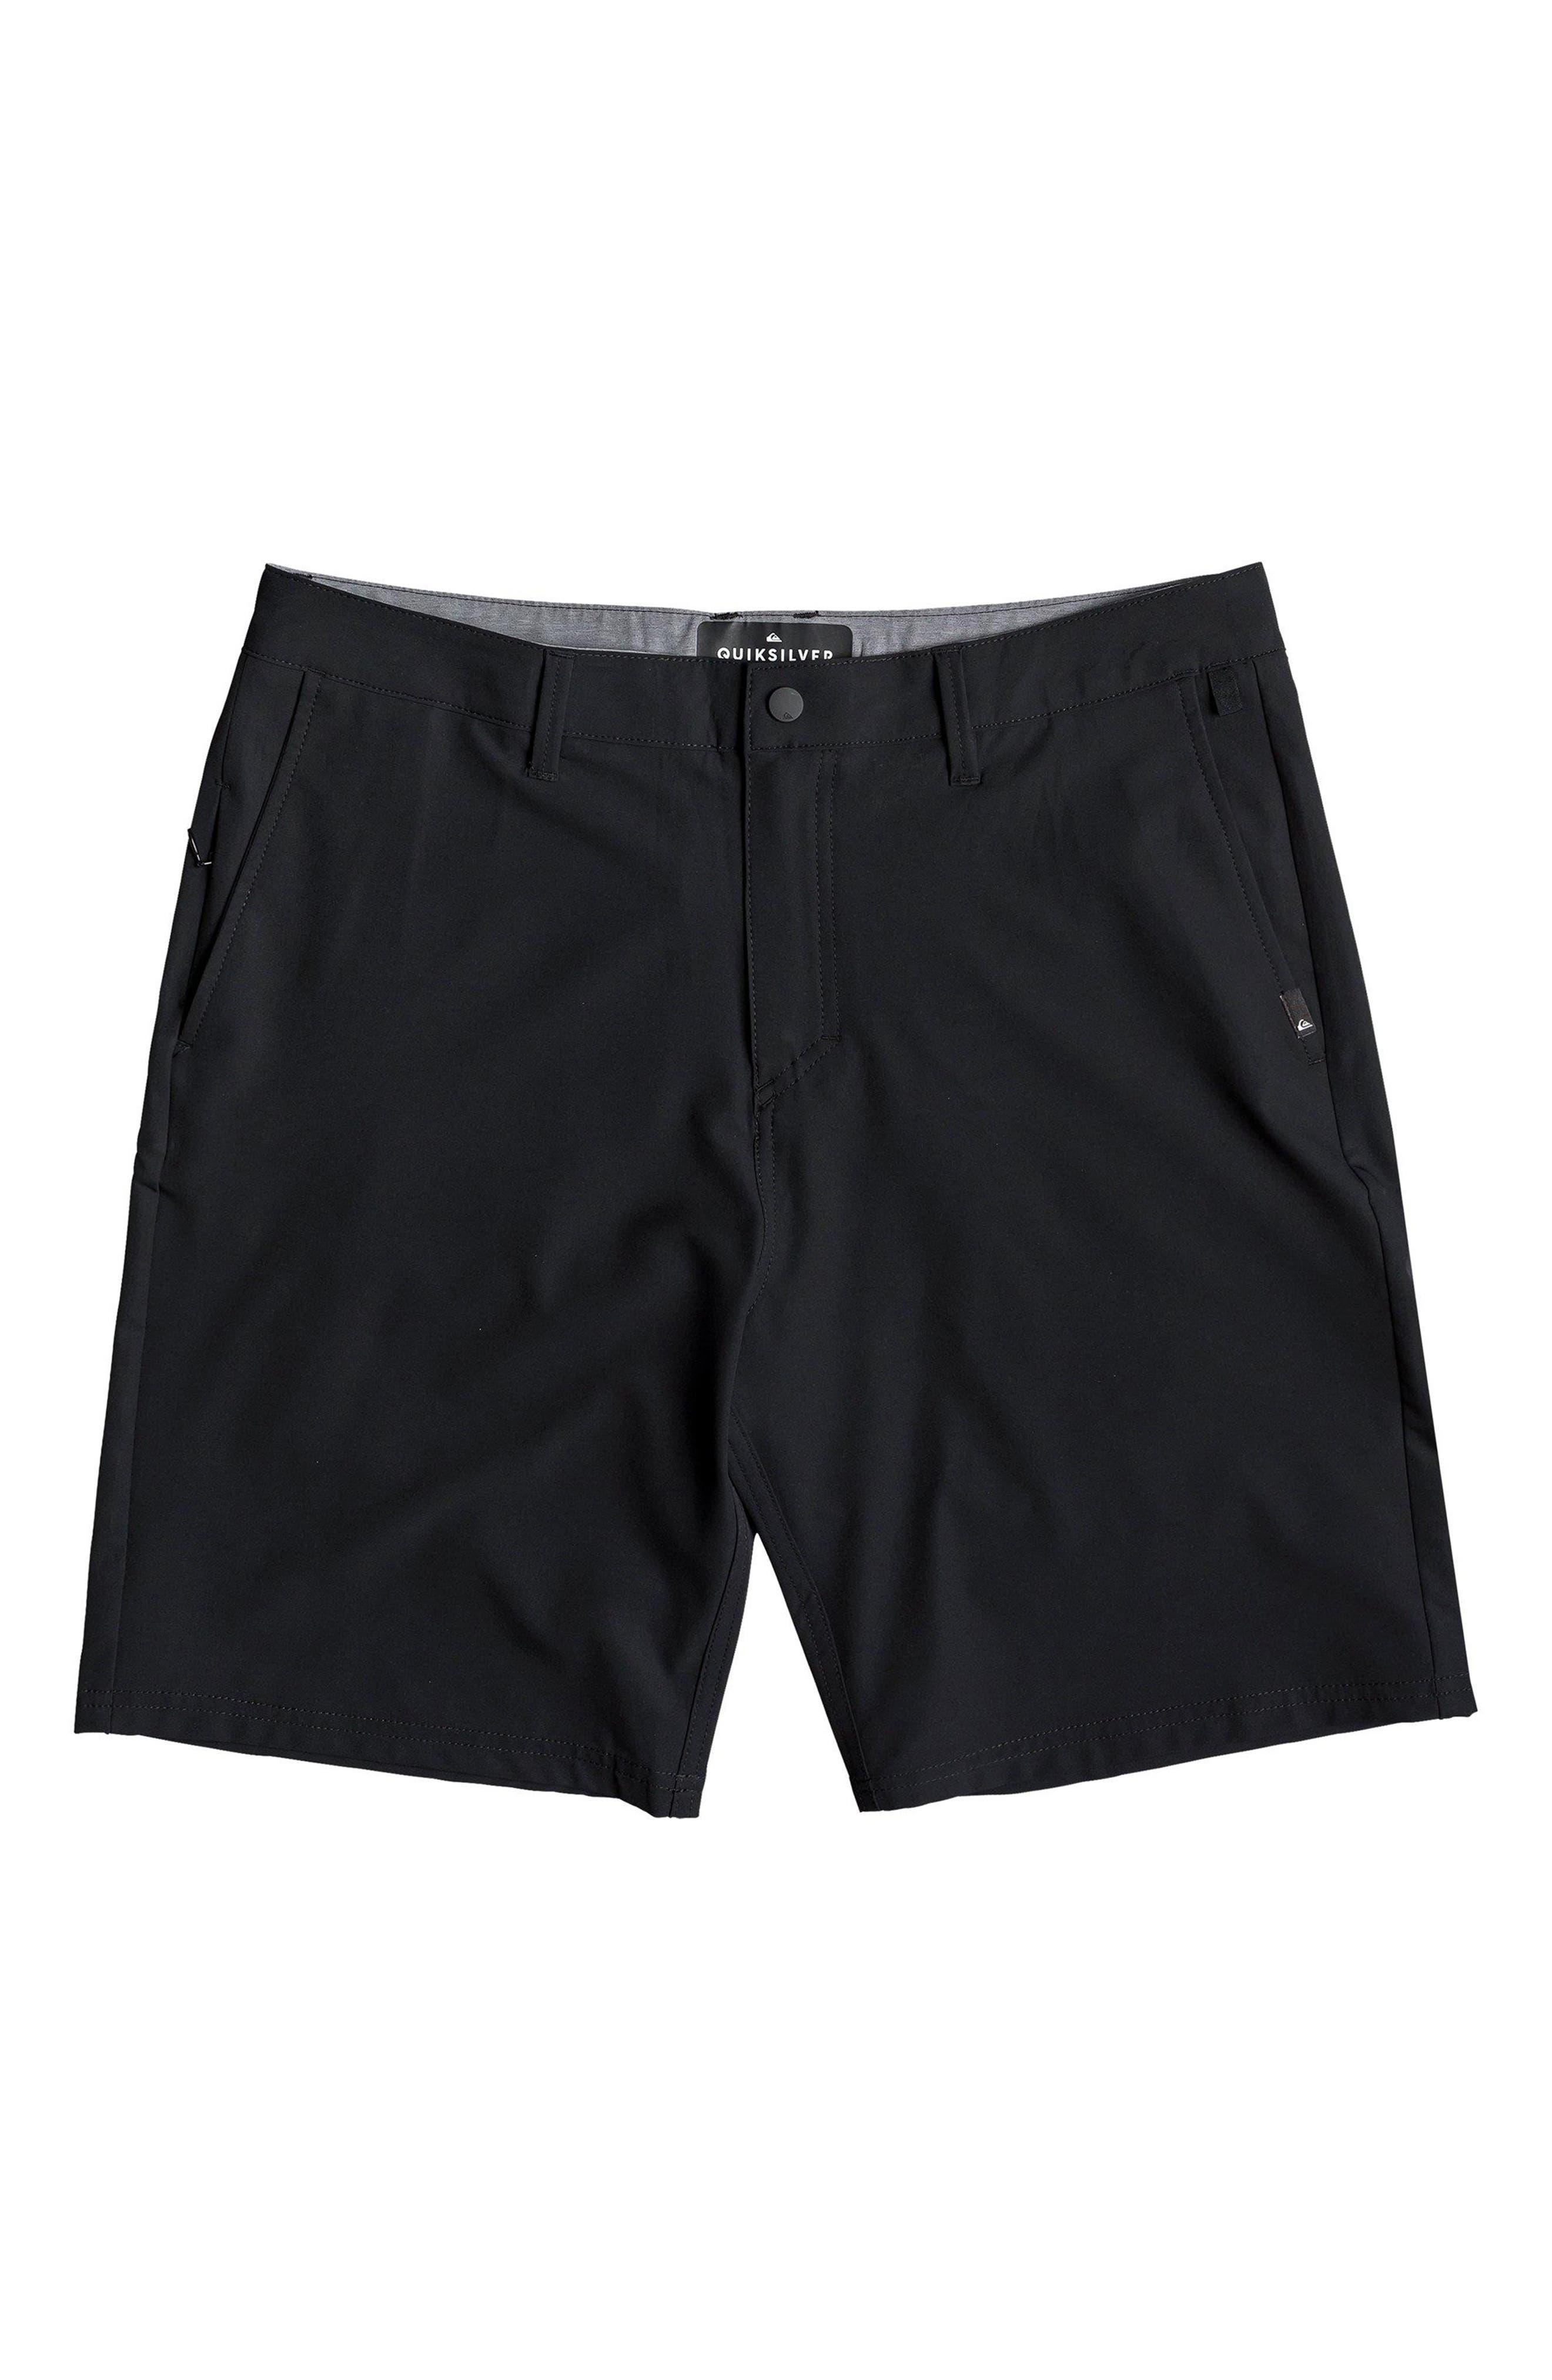 QUIKSILVER,                             Navigate Amphibian Shorts,                             Main thumbnail 1, color,                             BLACK